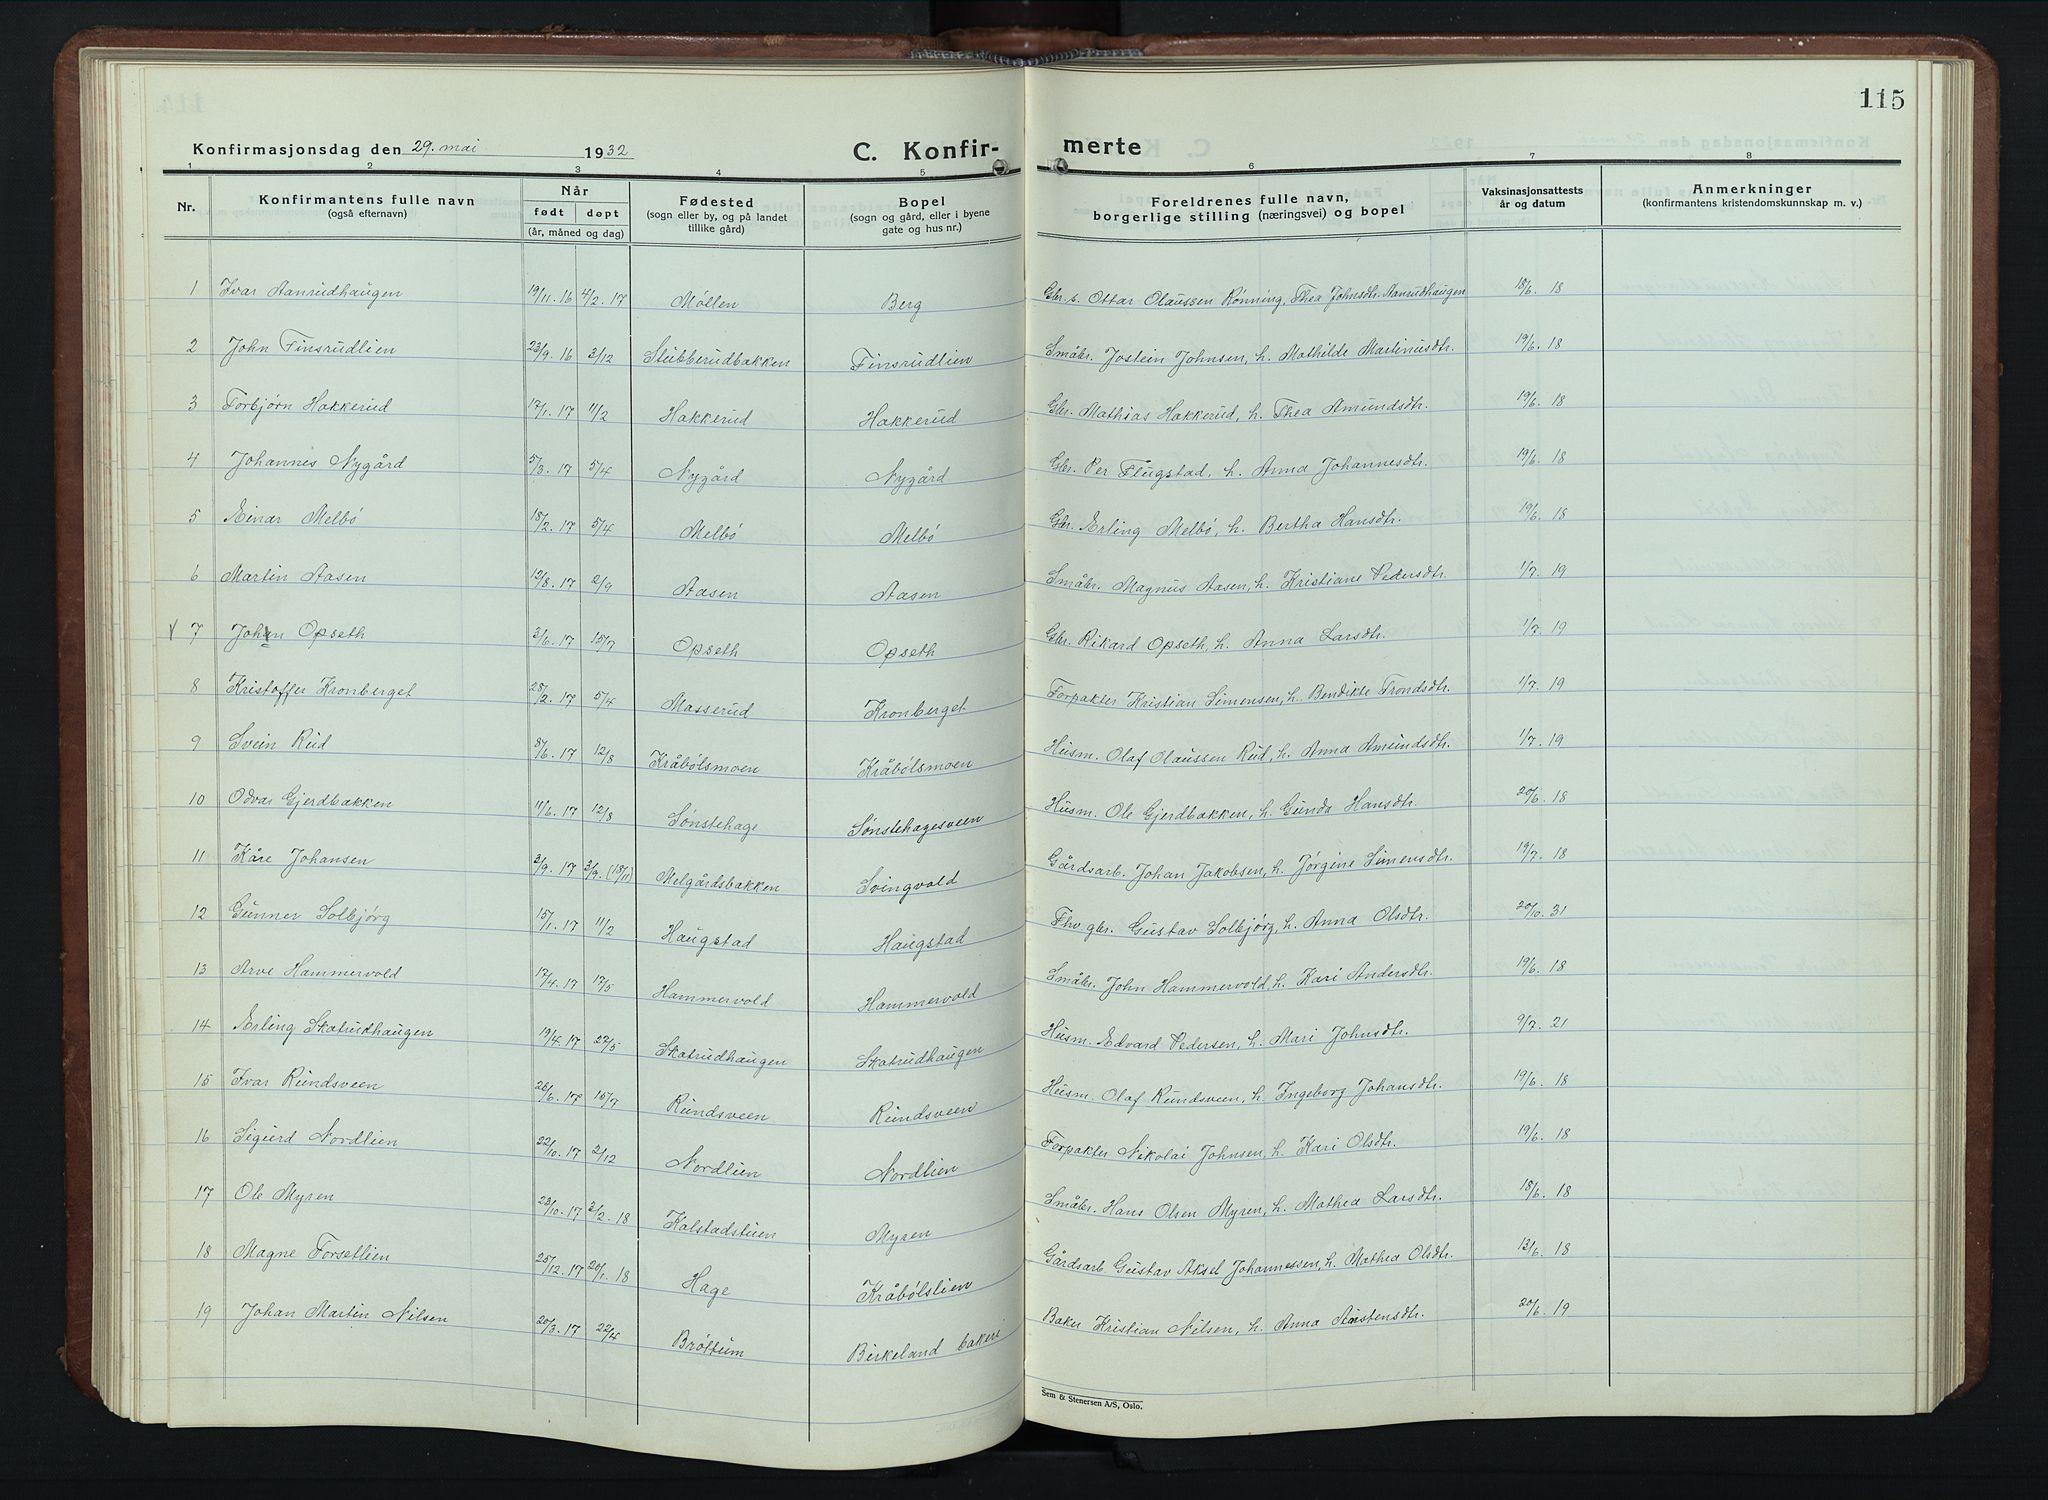 SAH, Vestre Gausdal prestekontor, Klokkerbok nr. 5, 1926-1955, s. 115